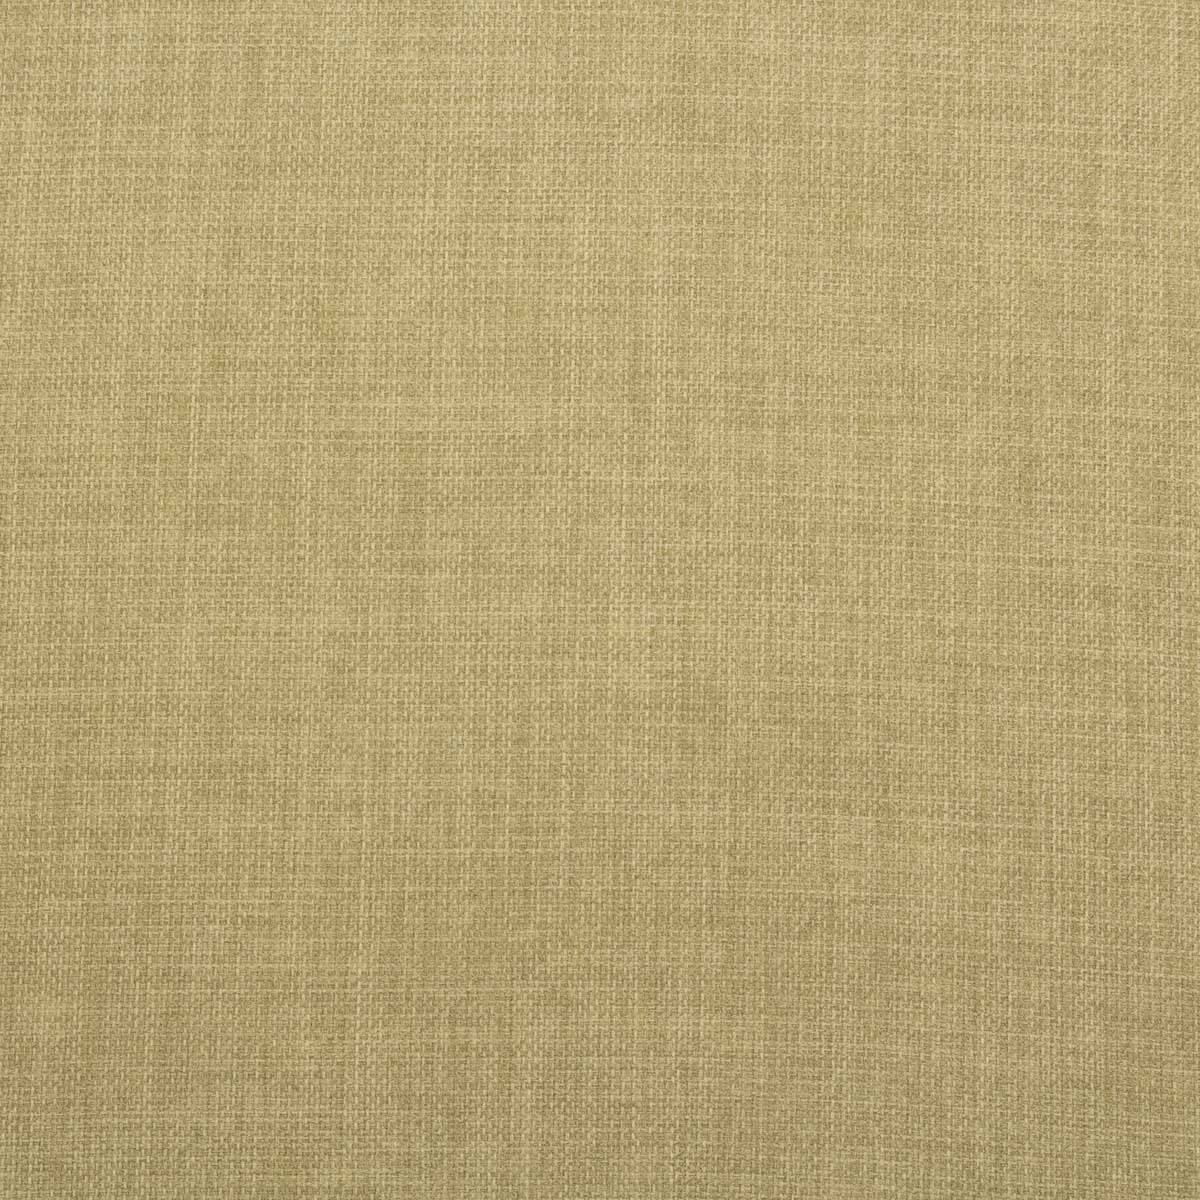 cream soft fabric sofa 8 way hand tied plain linen look designer curtain cushion ...